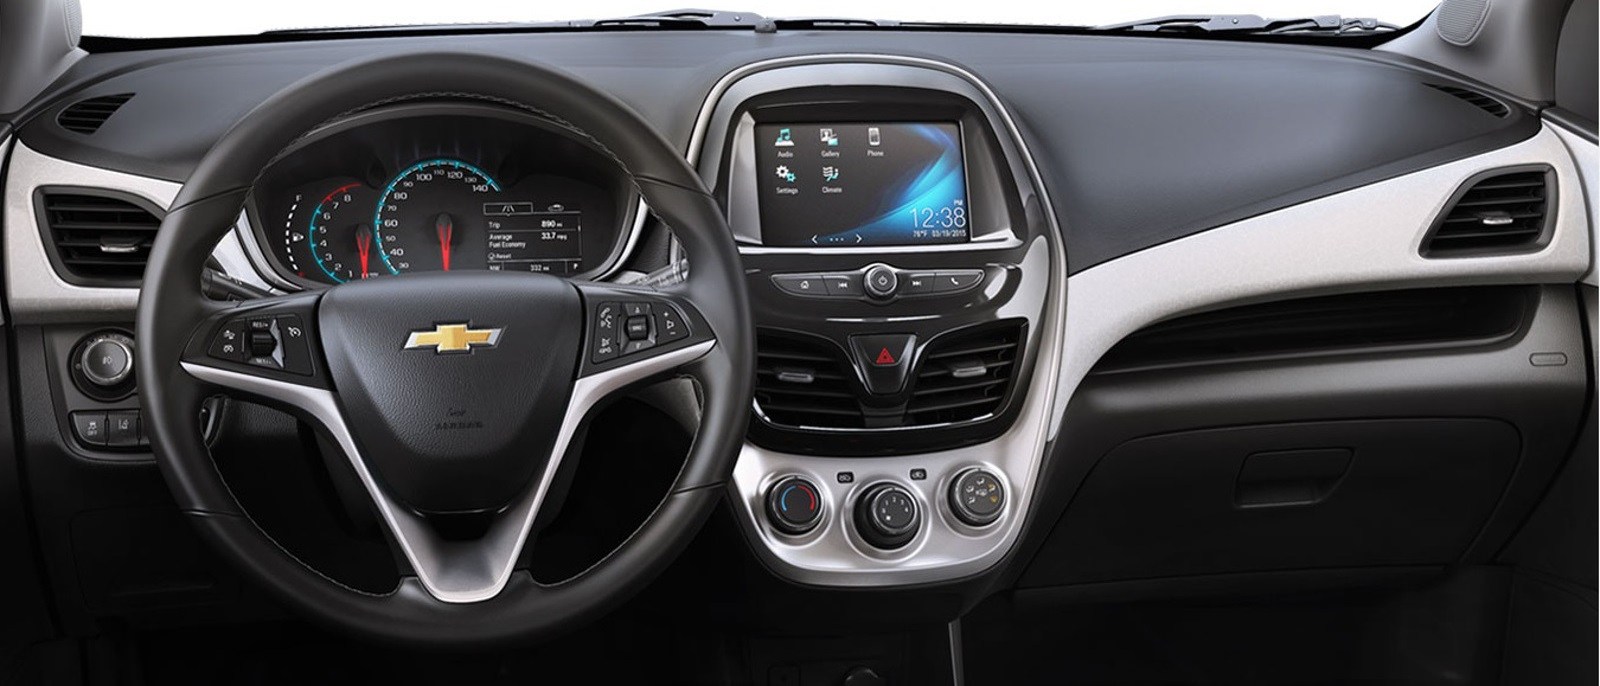 2016 Chevrolet Spark Interior